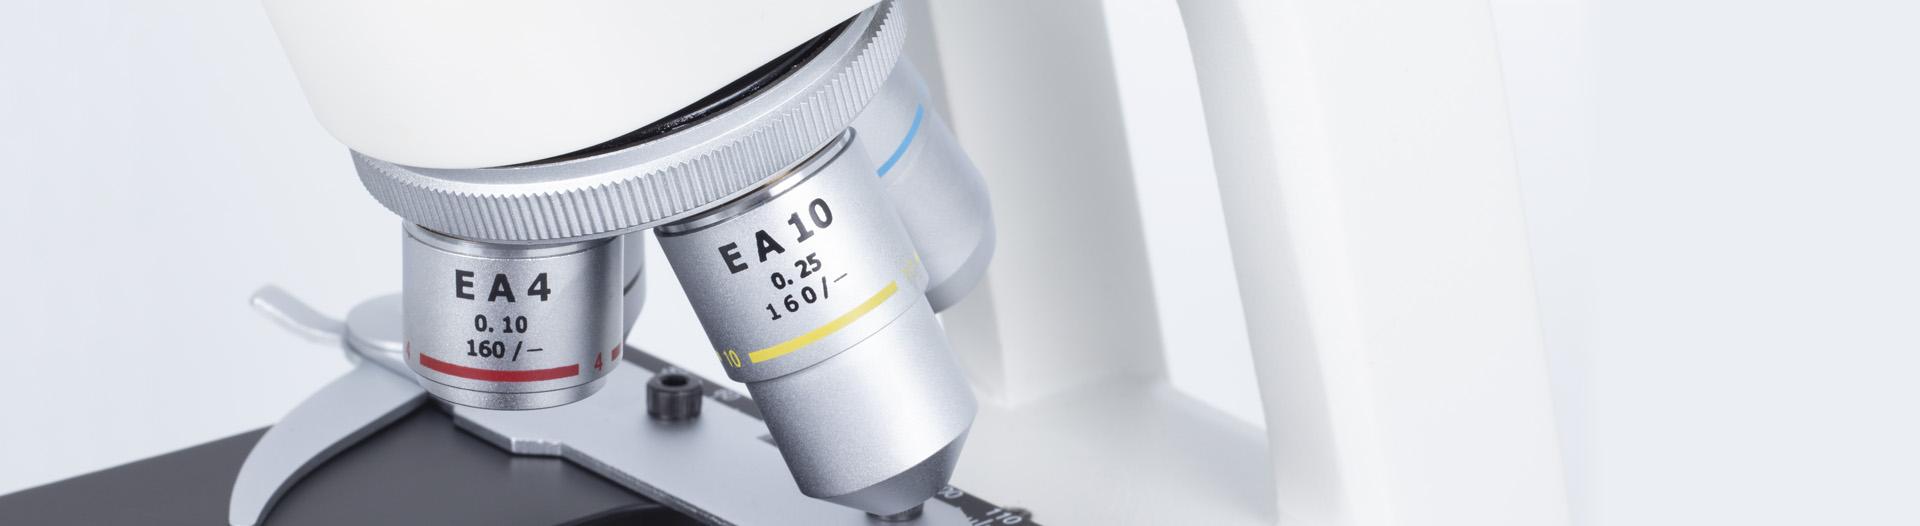 RED100 microscope optics